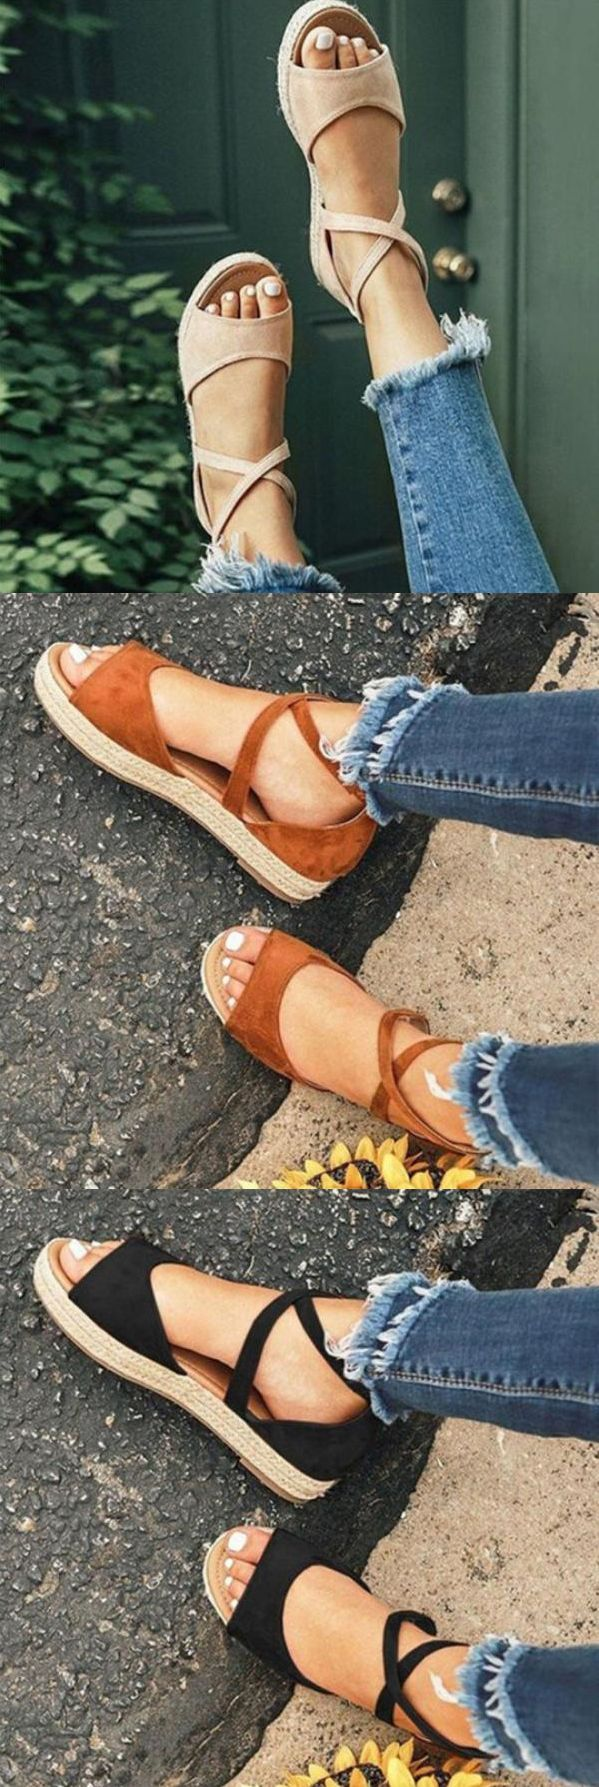 $29.99 USD Large Size Women Fashion Flat Heel Strap Flats Sandals Lace-up Shoes